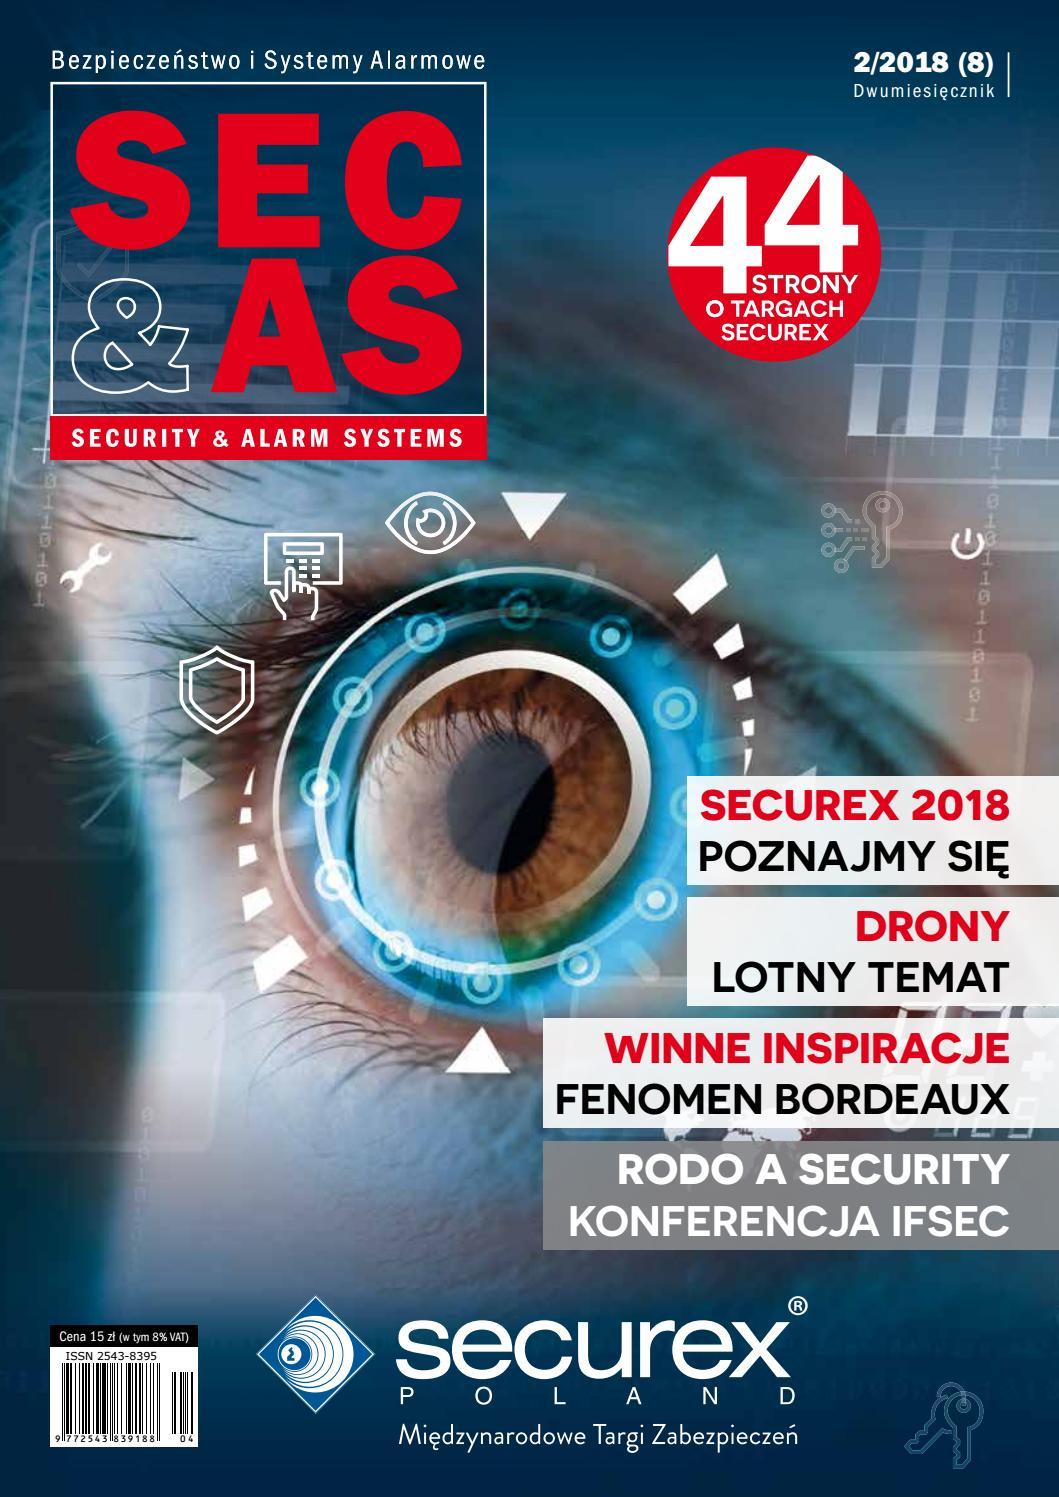 a76c2d22da6a70 SEC&AS (SECURITY & ALARM SYSTEMS) 2/2018 (8) by PISA (Polska Izba Systemów  Alarmowych) - issuu